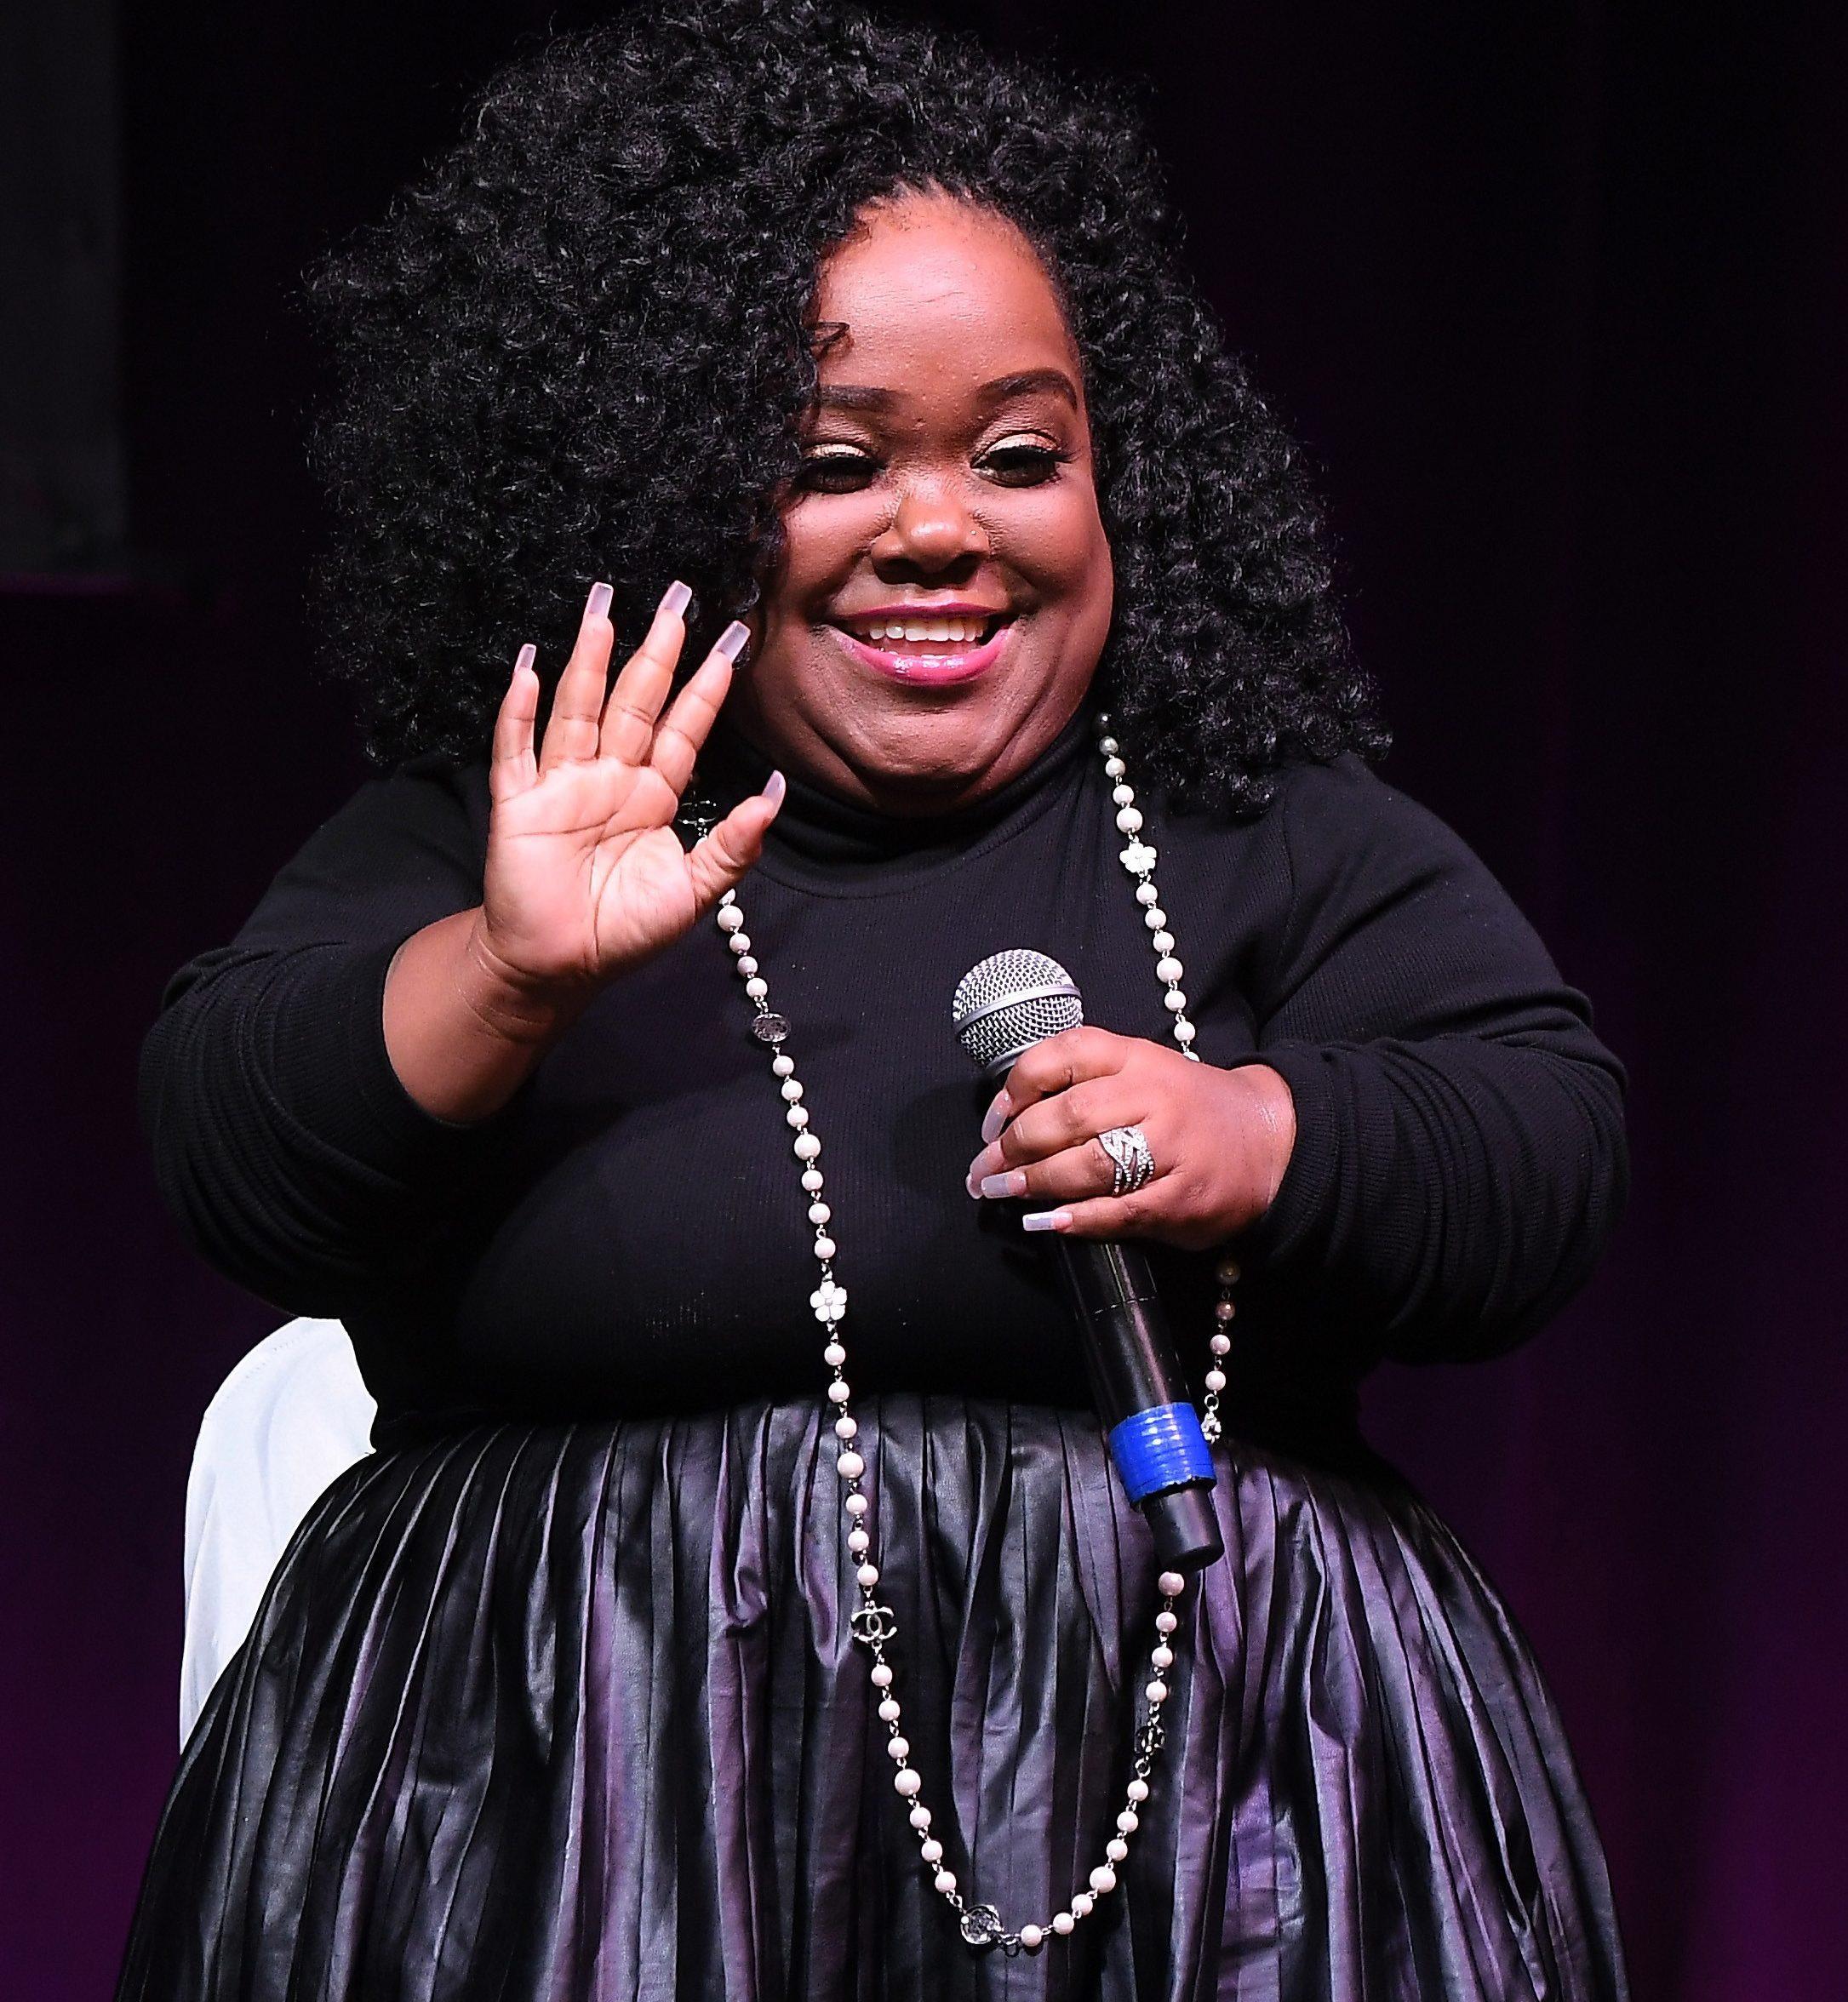 'Little Women Atlanta' star Ms. Minnie killed in car accident lindaikejisblog 2